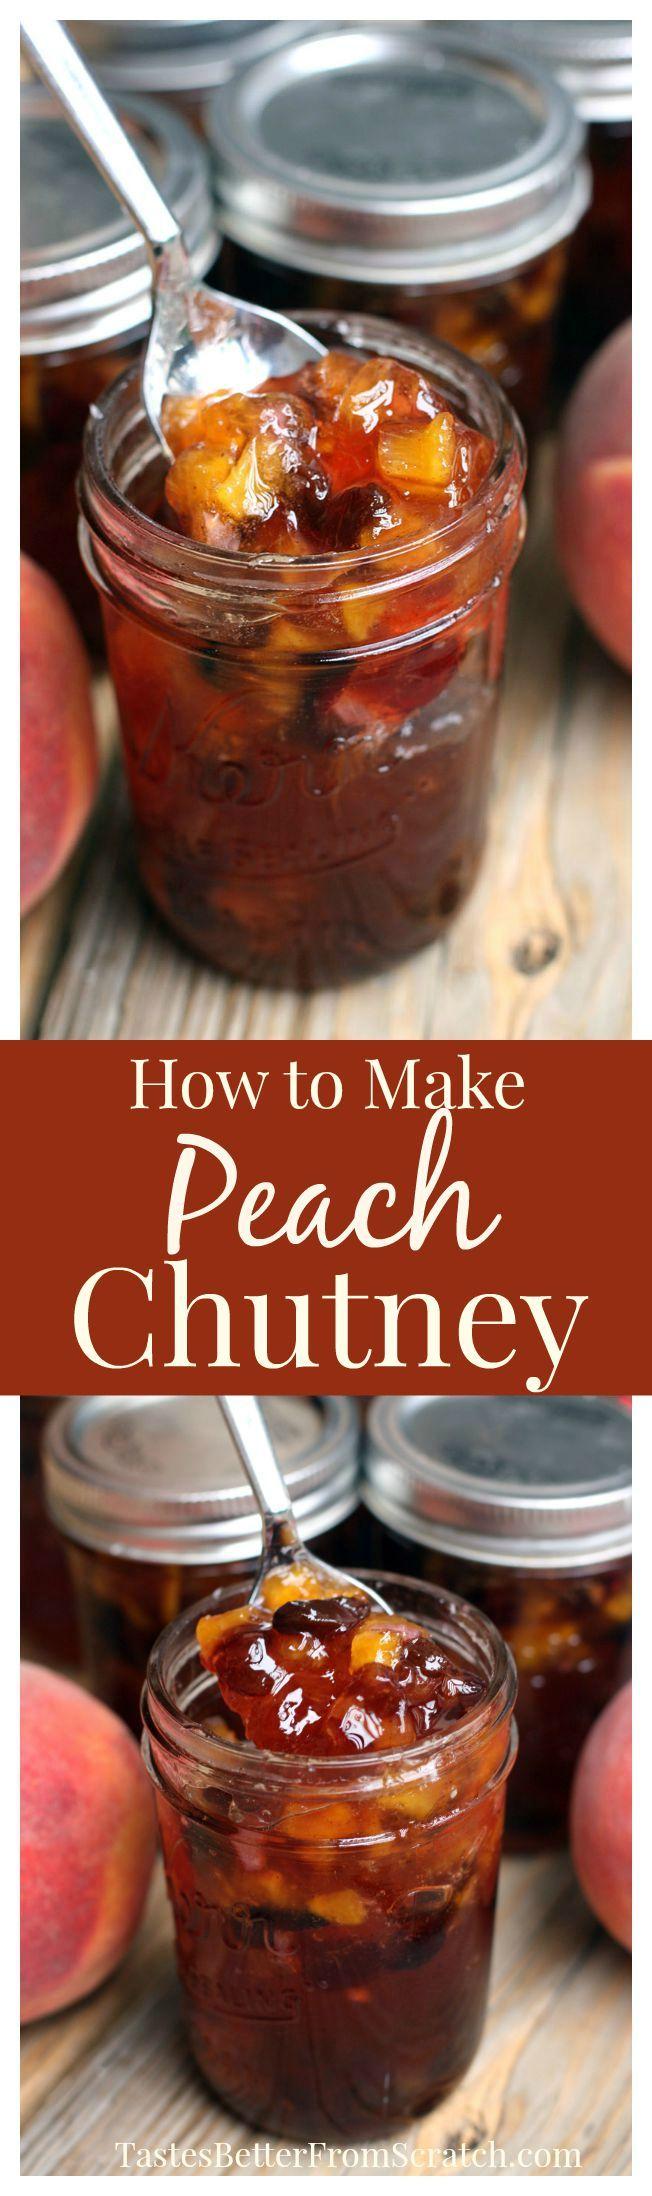 Homemade Peach Chutney